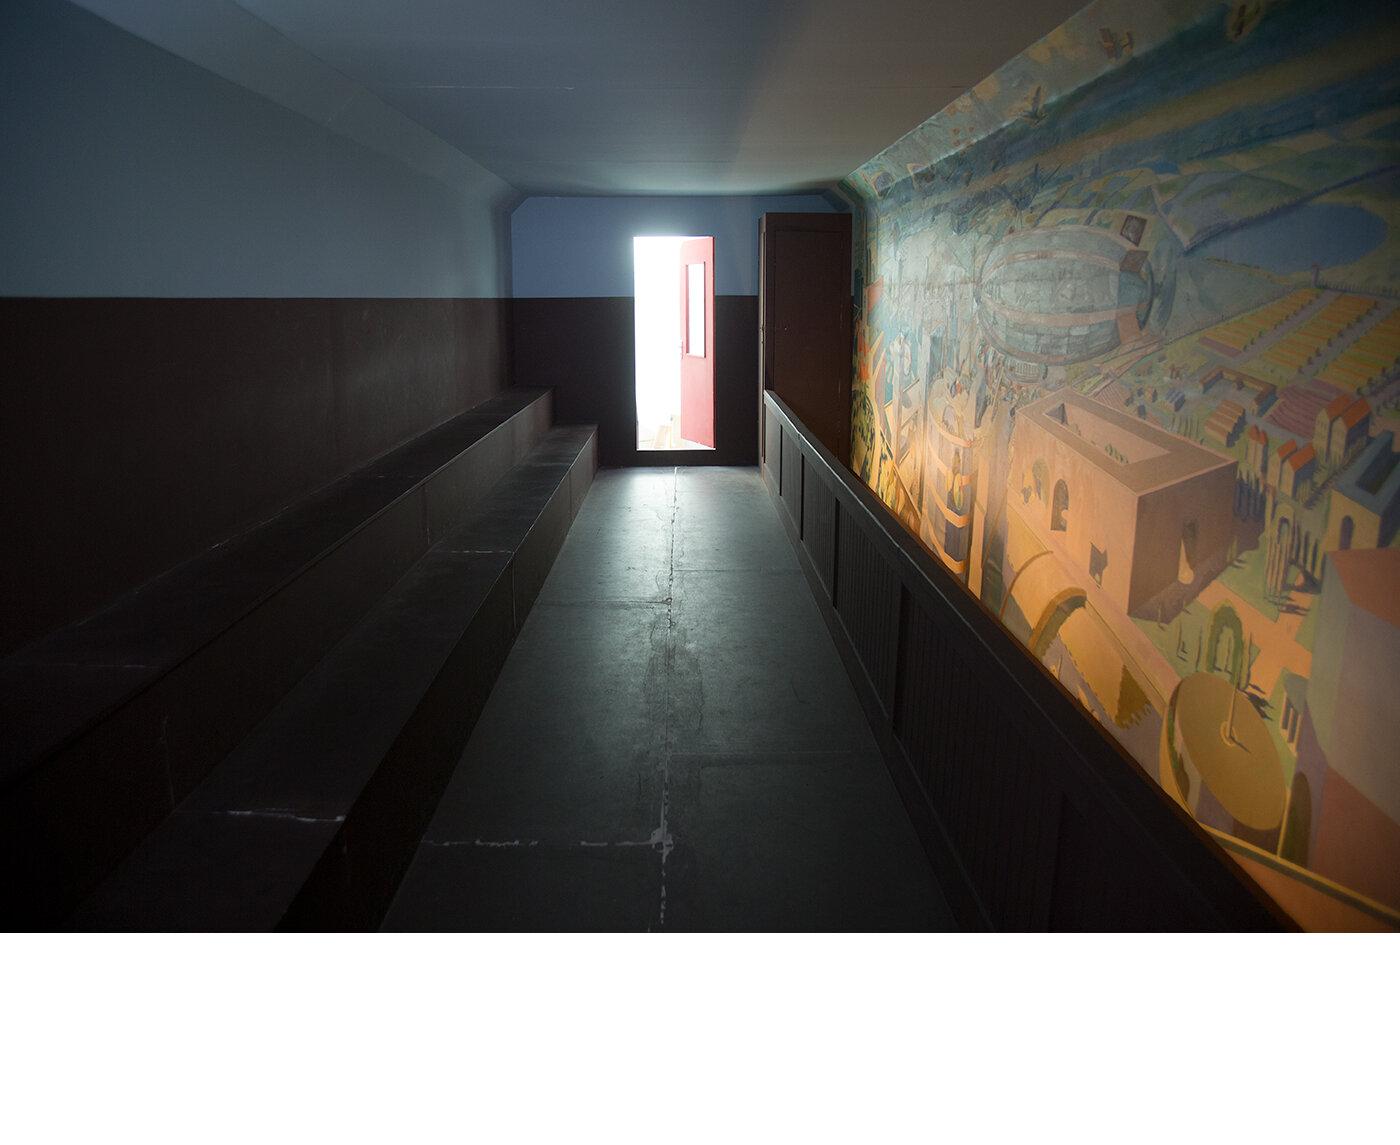 View-of-installation-Hermitage-State-Museum-St.-Petersburg-Russia-2017-2.jpg